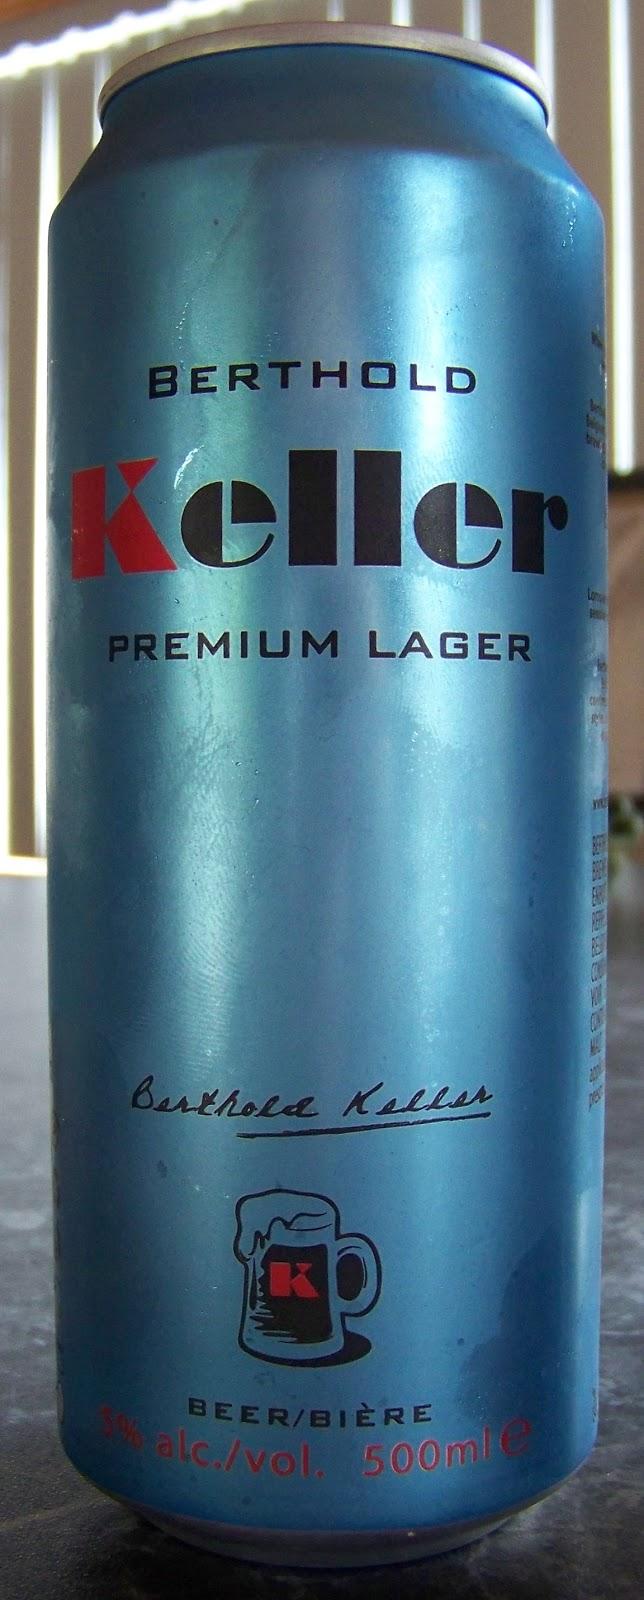 Berthold Keller Premium Lager   Brouwerij Martens NV ...